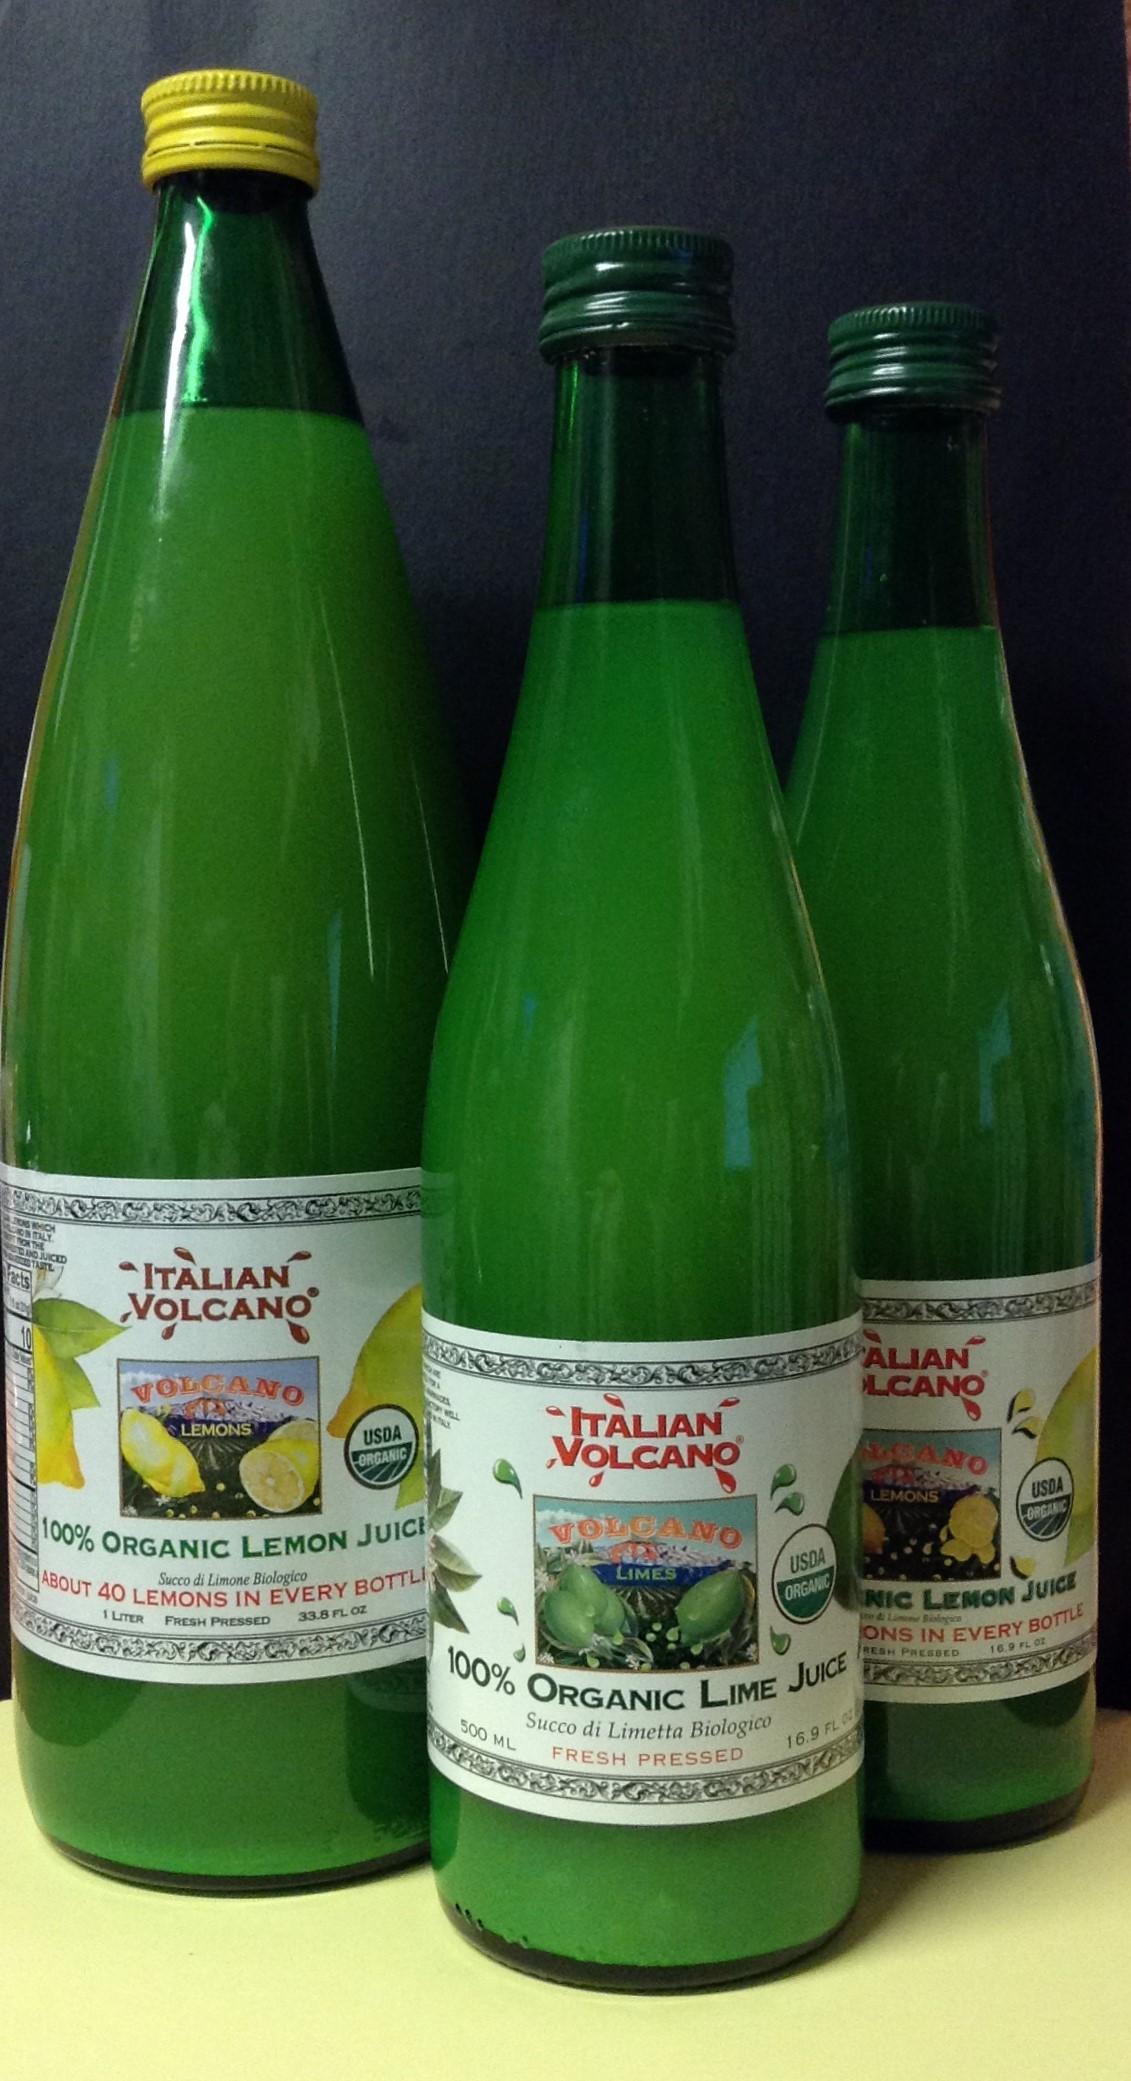 ITALIAN VOLCANO Organic Lemon/Lime Juice